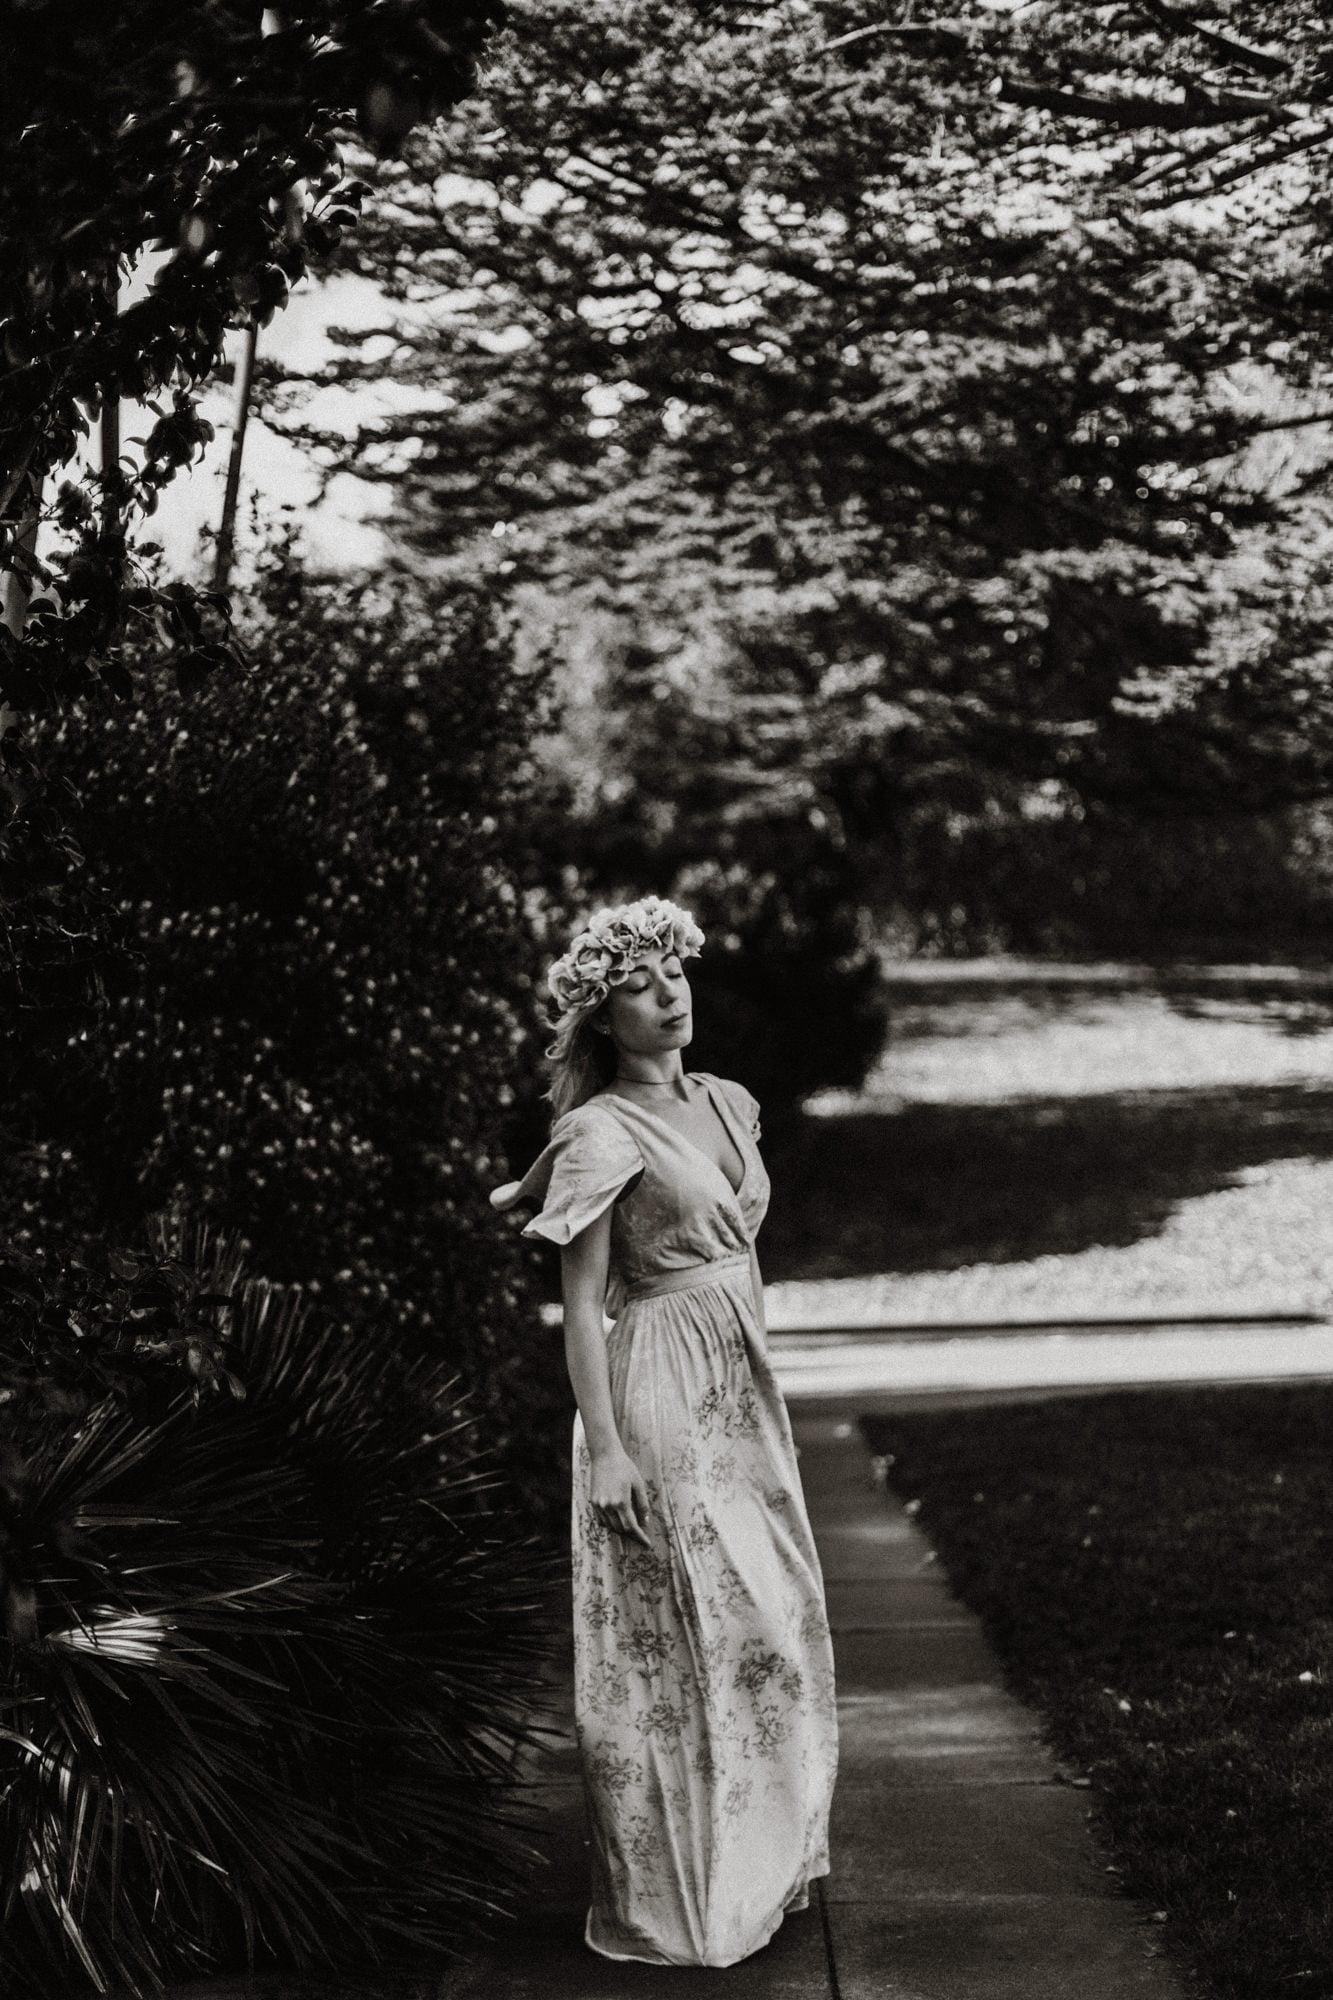 Edinburgh Portrait Photographer, Edinburgh Portrait Photoshoot in Royal Botanic Garden, Emili